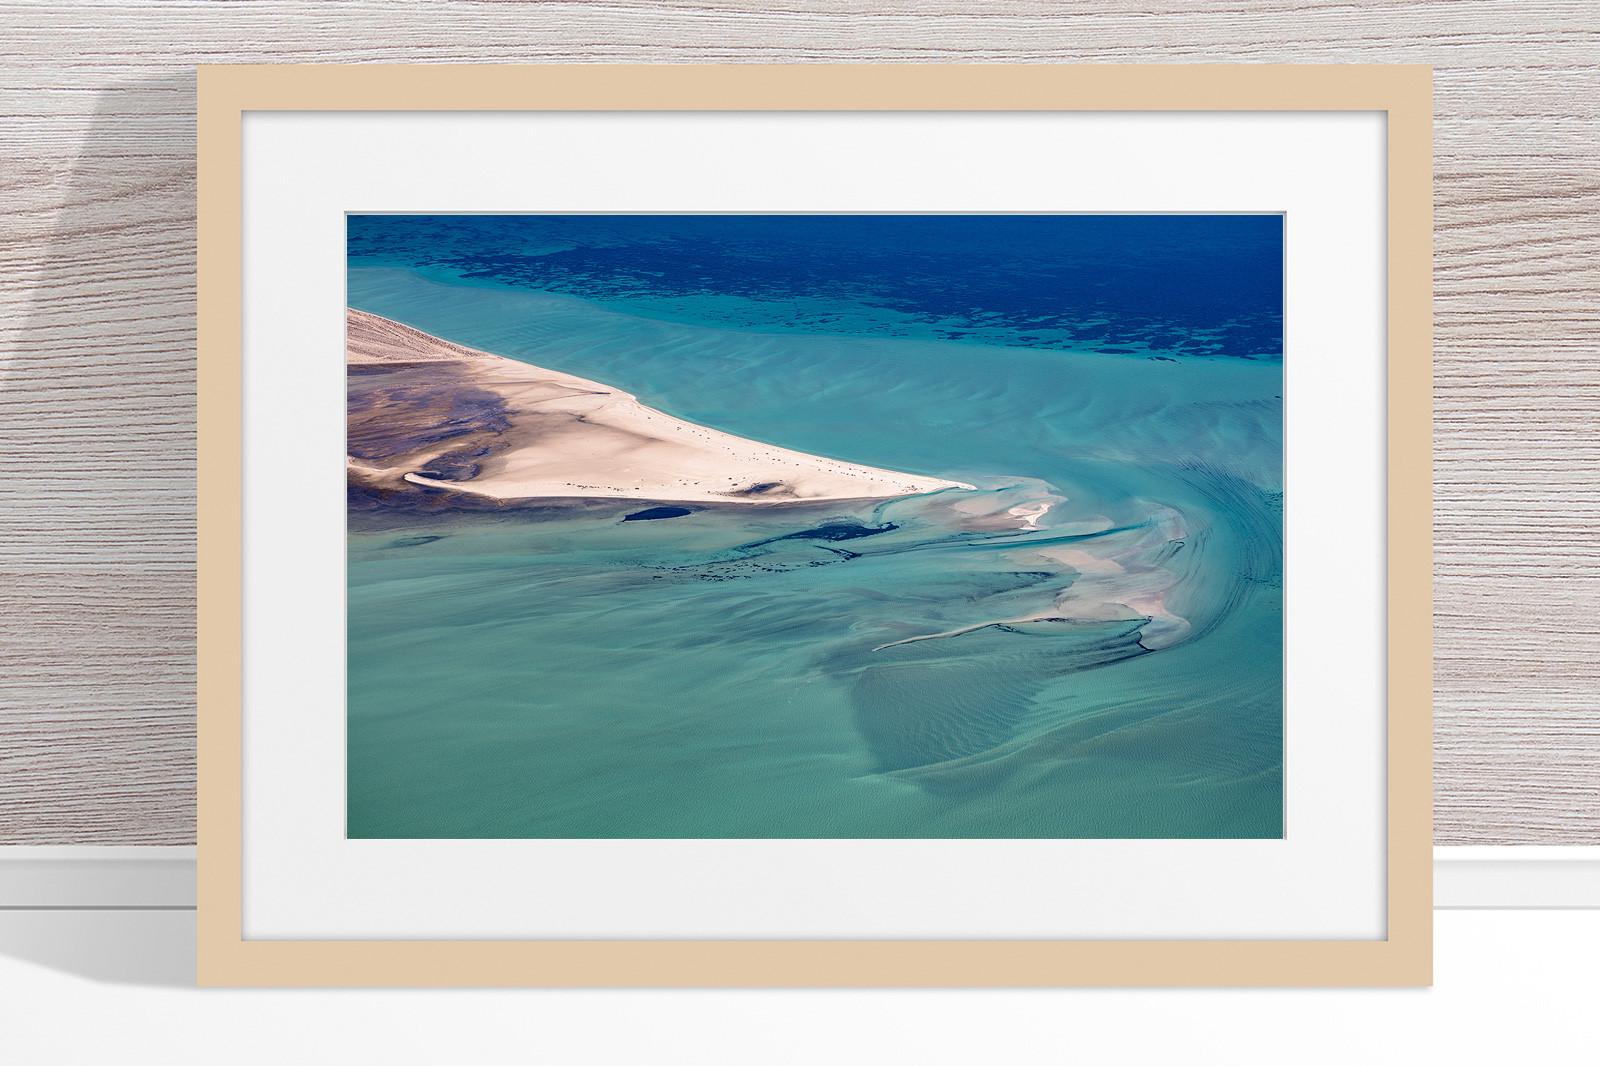 Jason Mazur - 'Shark Bay Aerial 088' Light Wood Frame